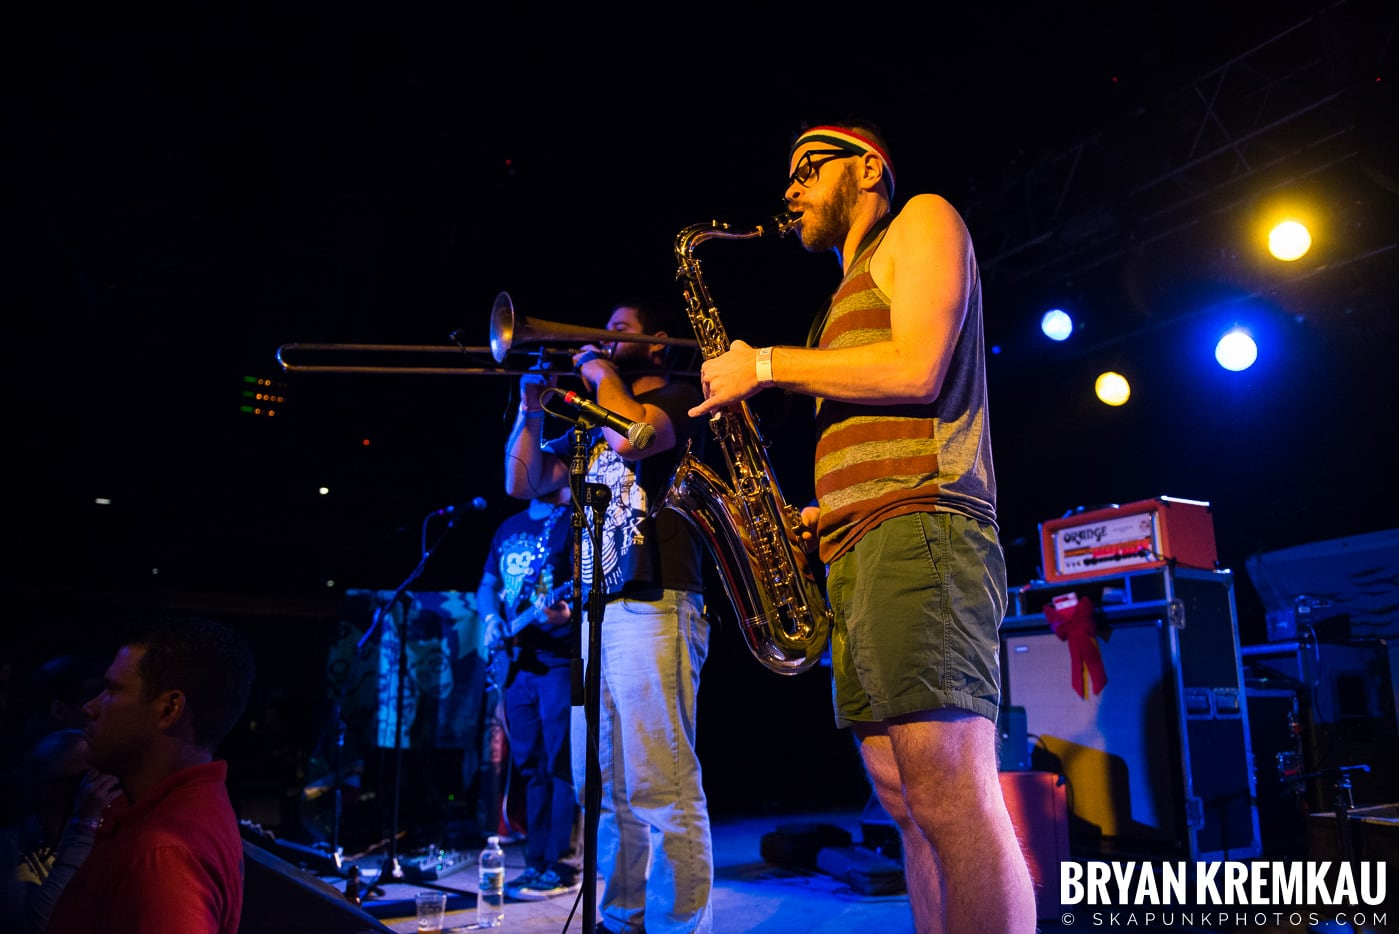 Backyard Superheroes @ Starland Ballroom, Sayreville, NJ - 11.23.18 (15)